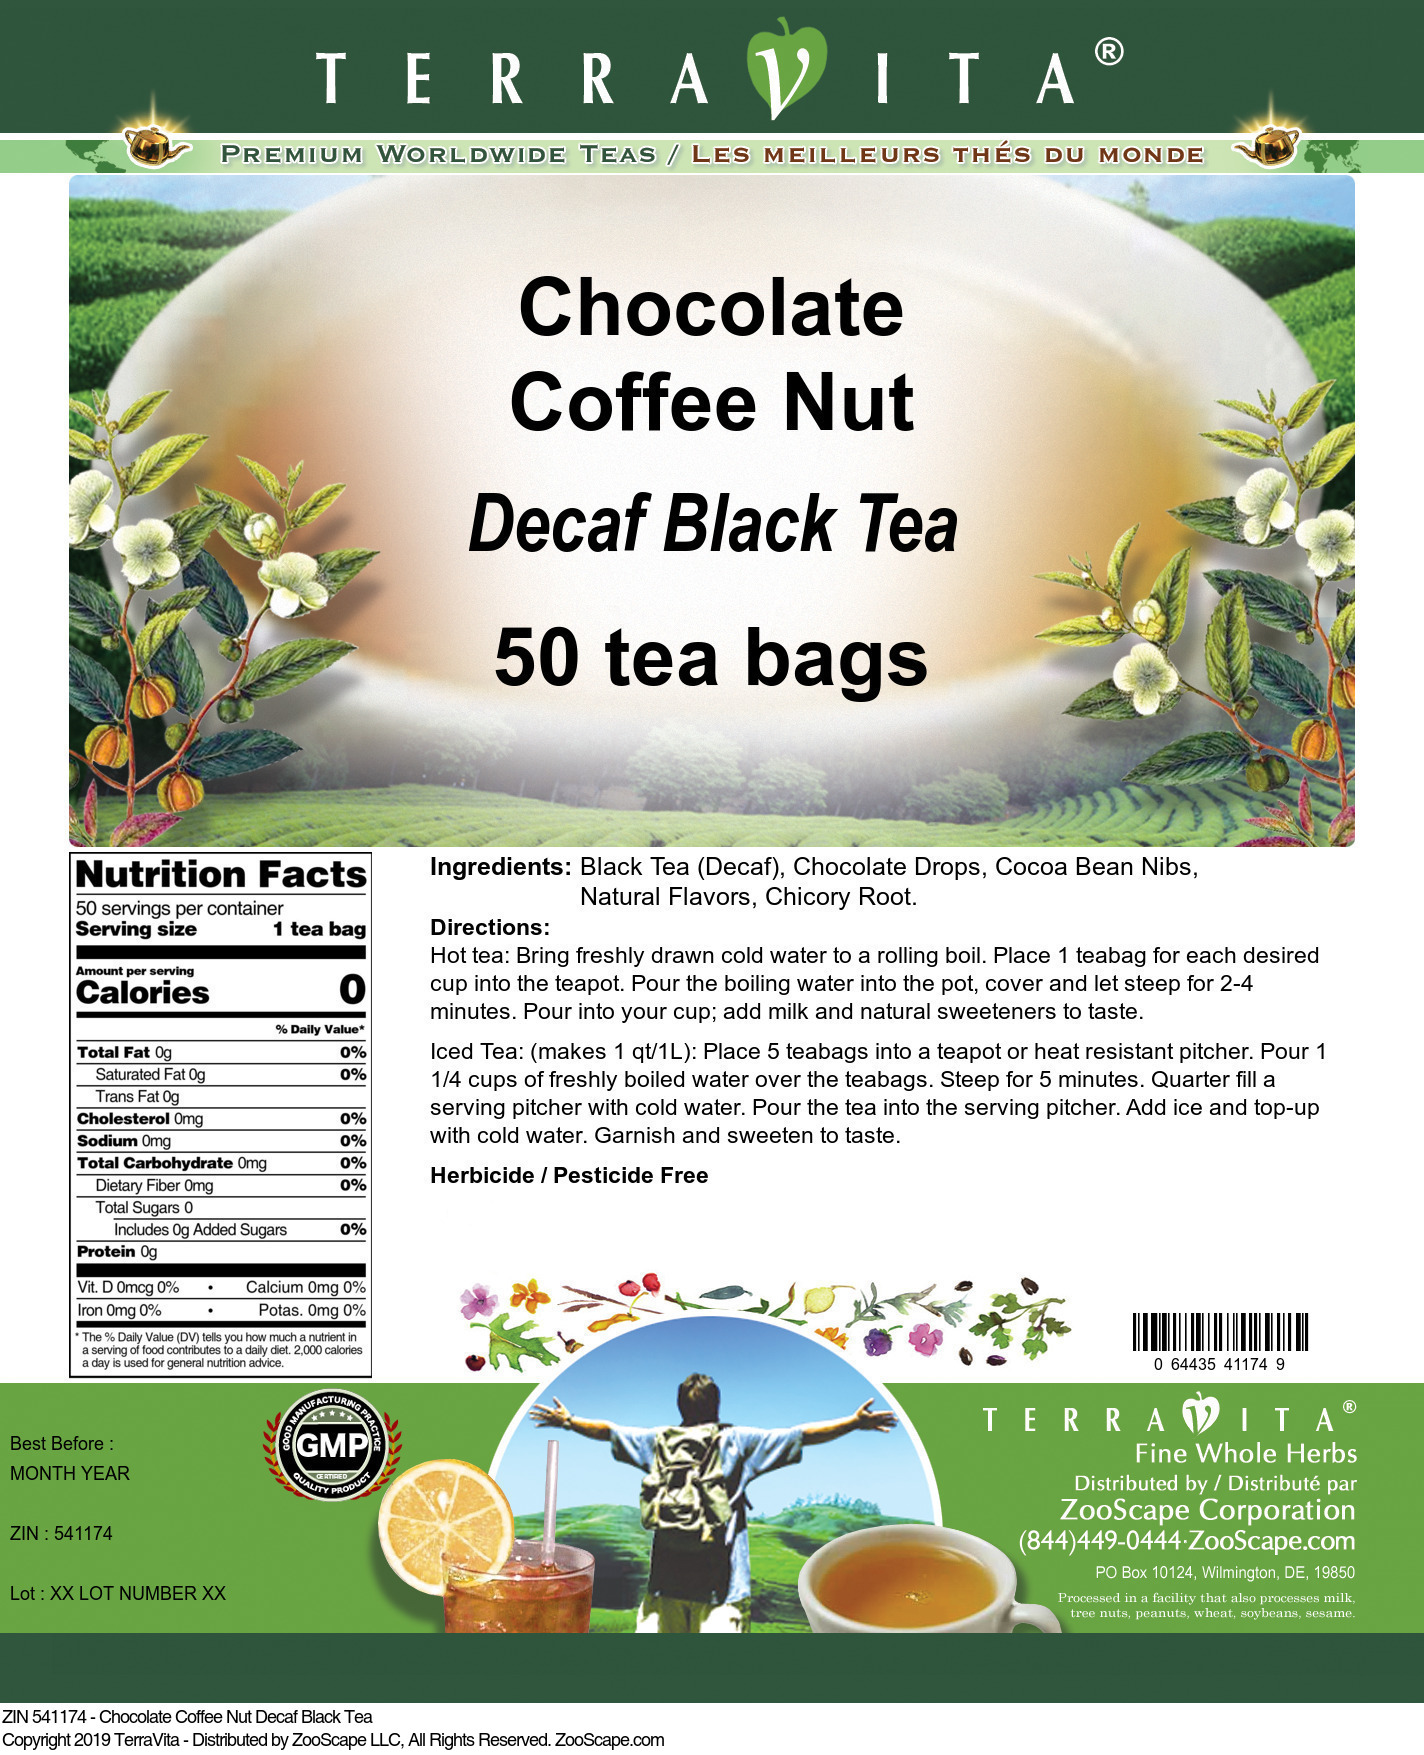 Chocolate Coffee Nut Decaf Black Tea